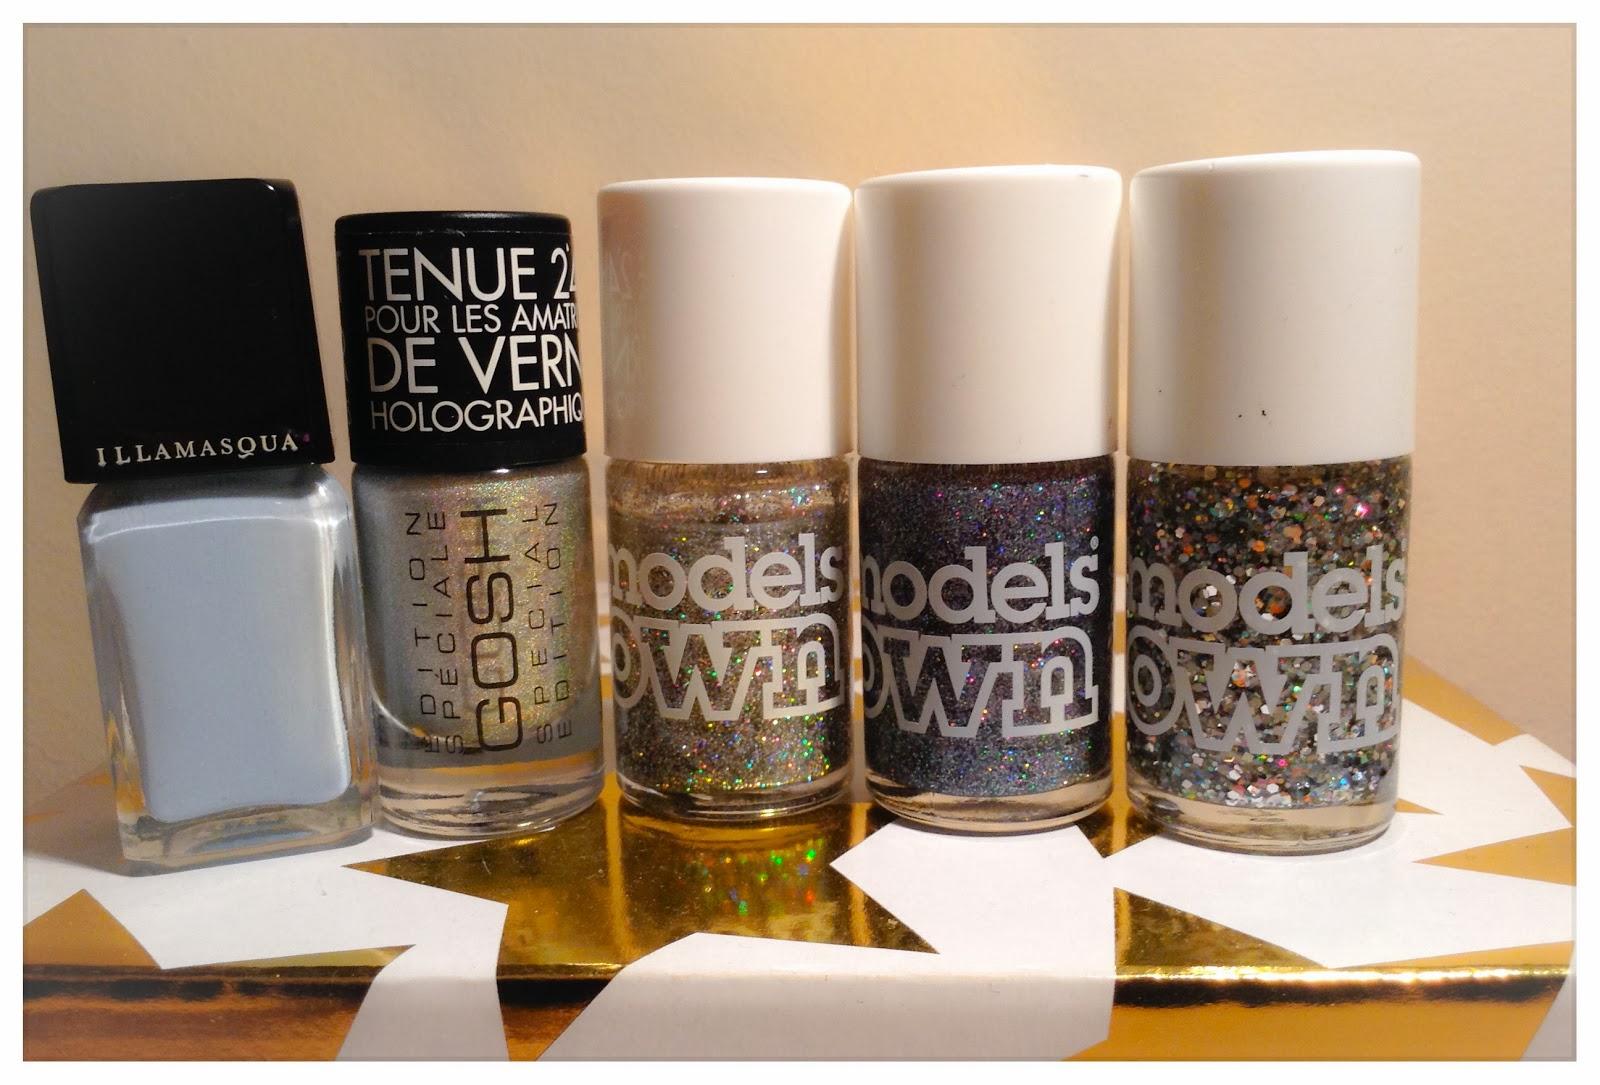 Nail-Art-glitter-manicure, models-own-illamasqua-GOSH